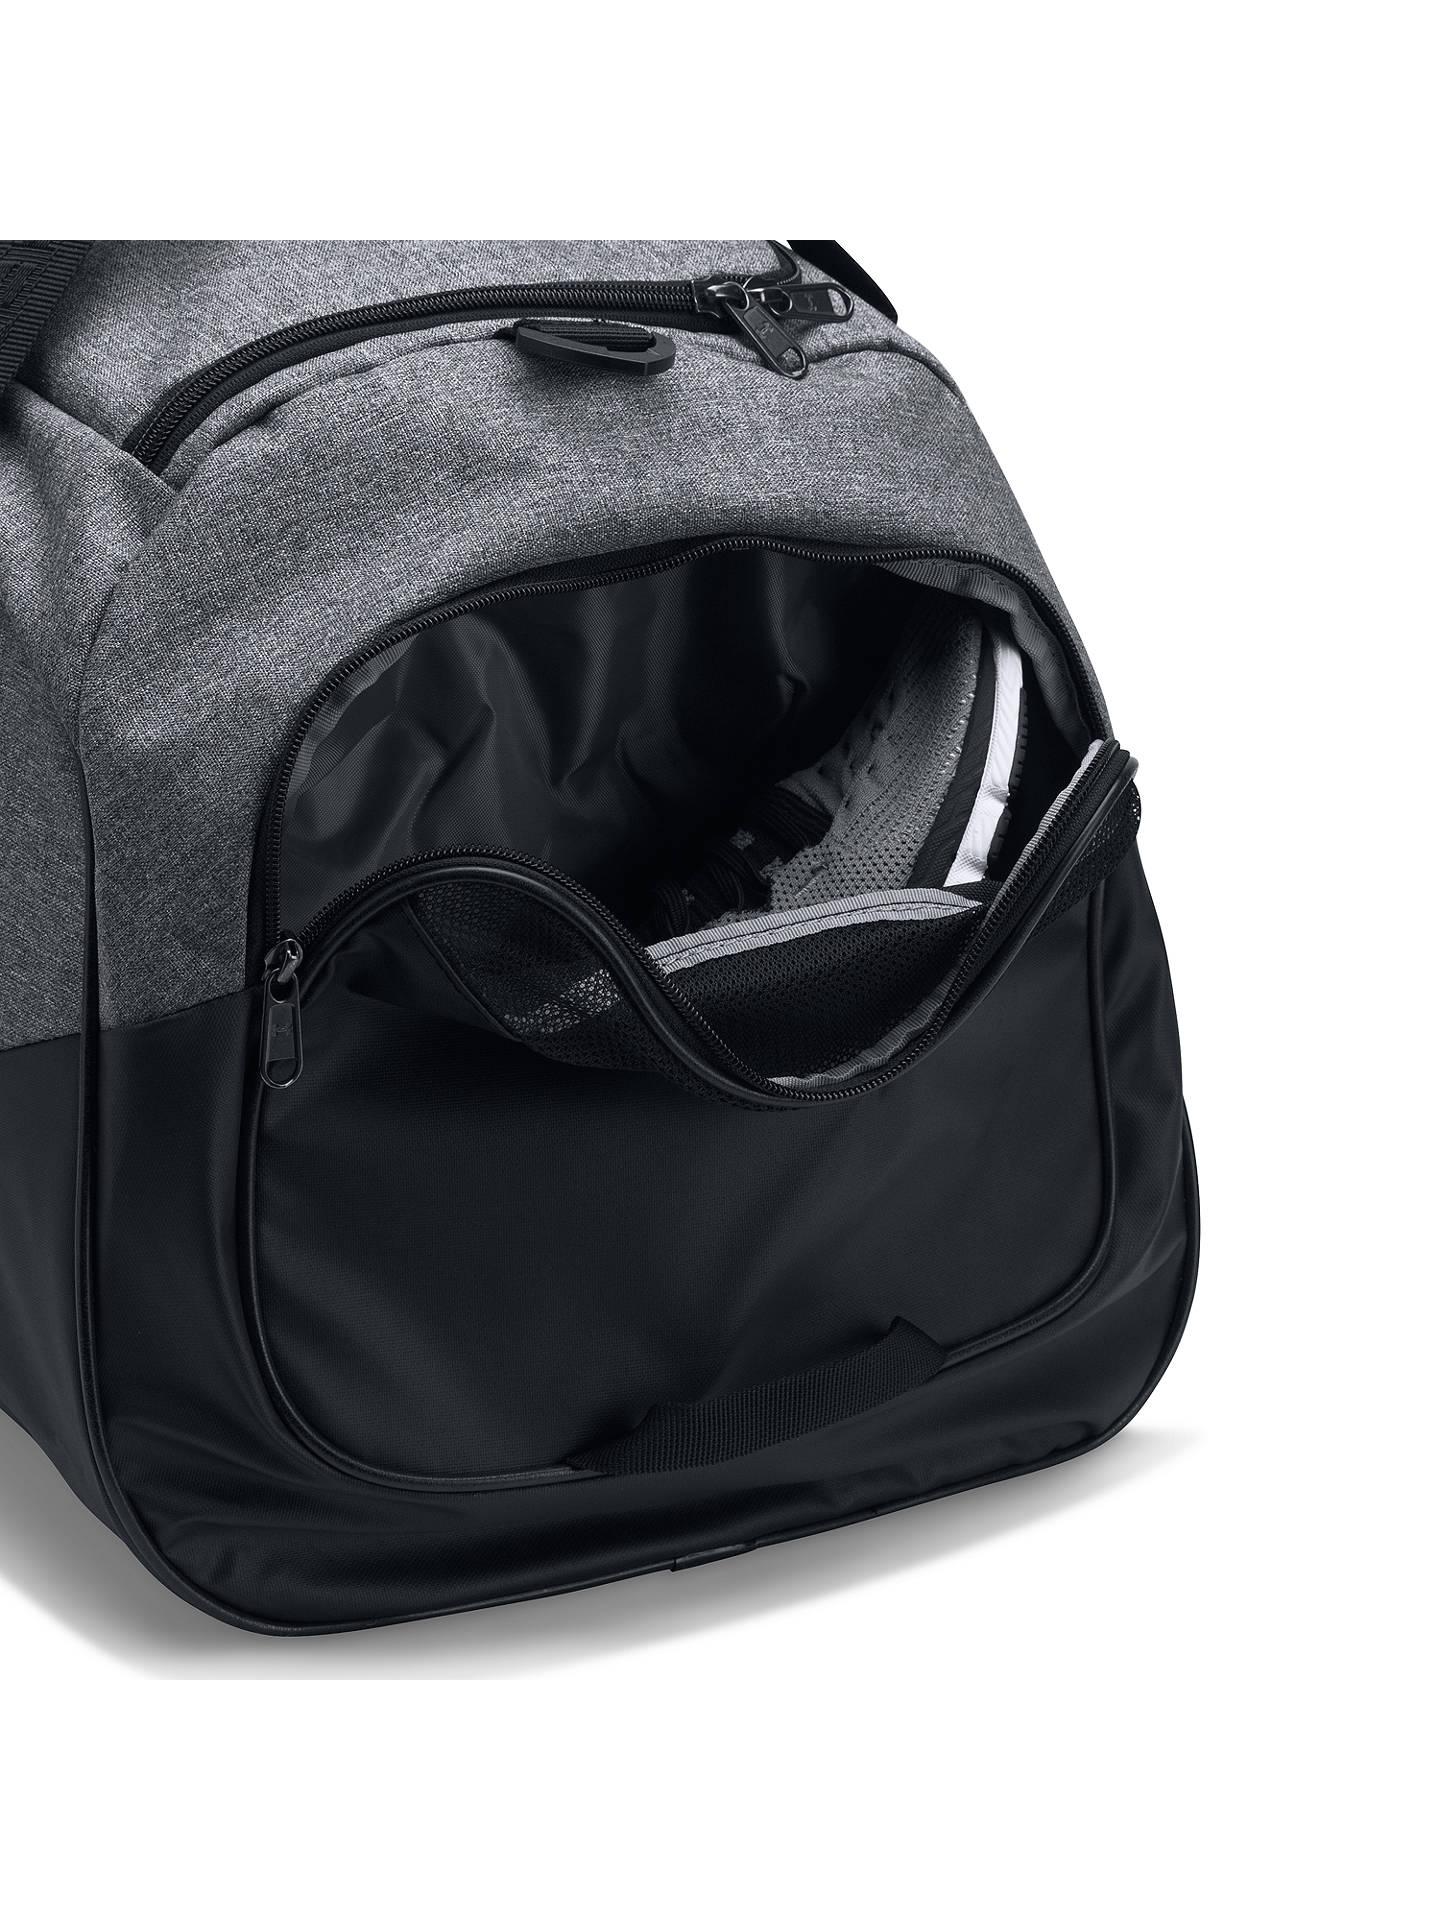 ... BuyUnder Armour Storm Undeniable 3.0 Duffle Bag b1378a3025bd1